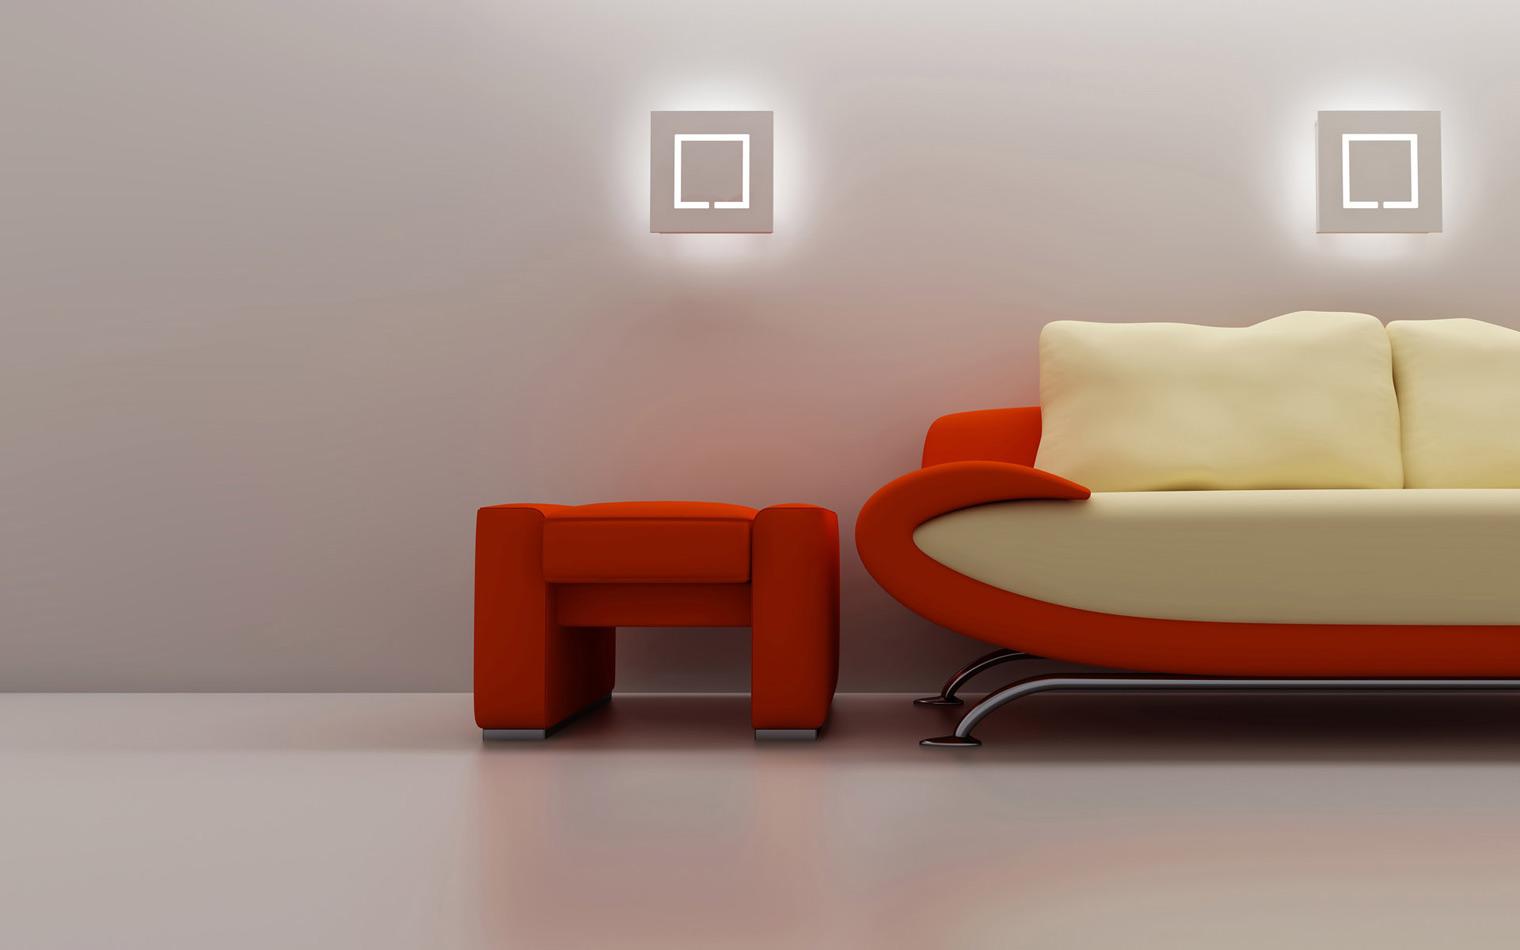 furniture computer wallpapers desktop - photo #44